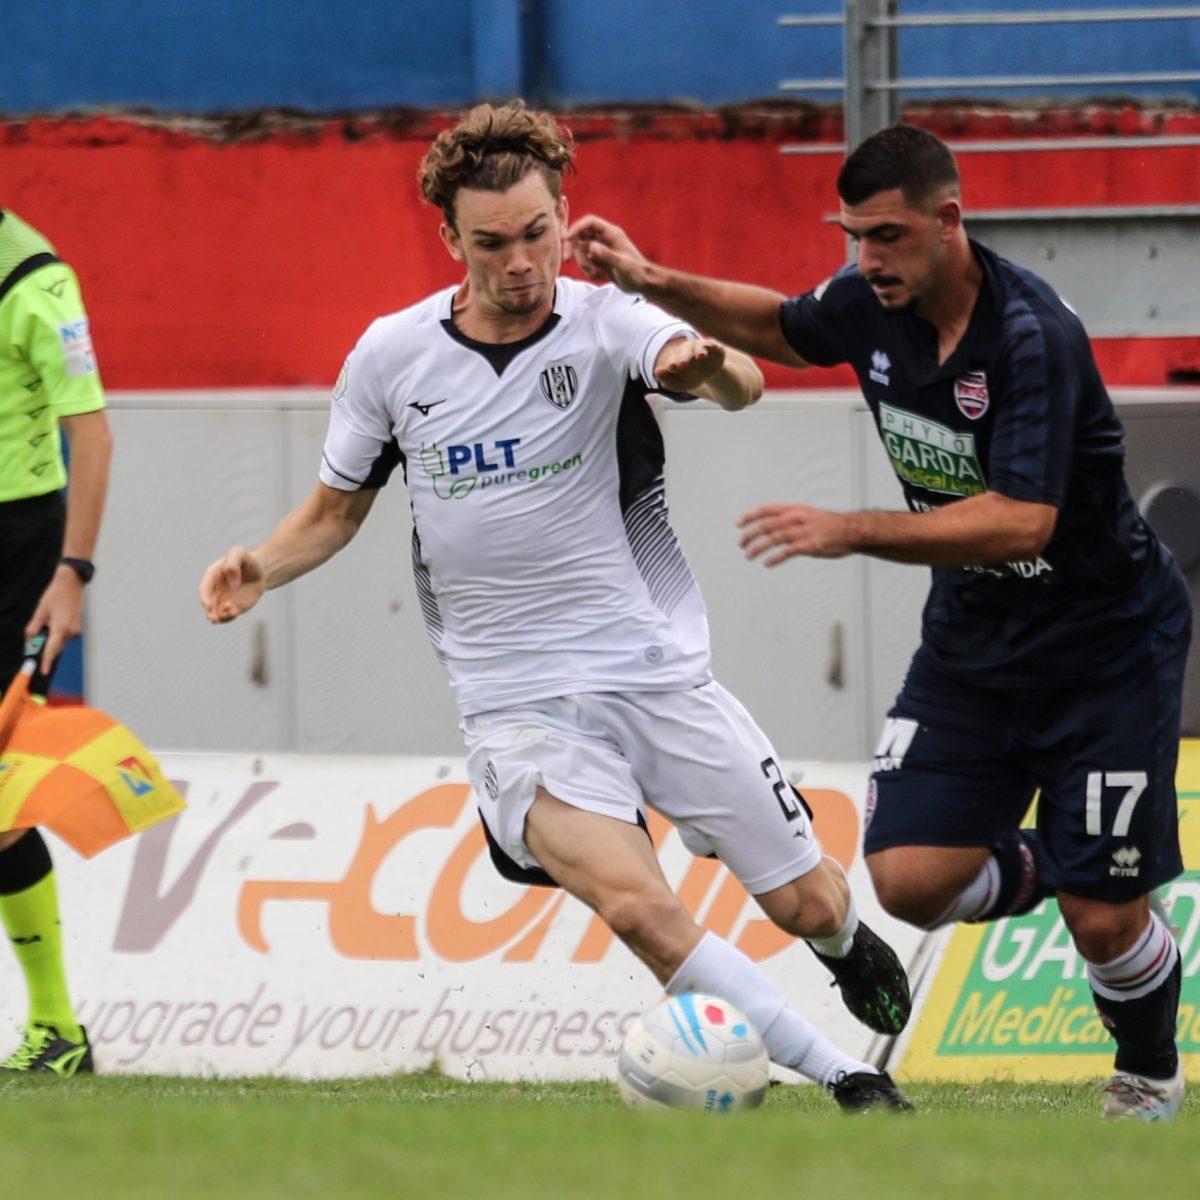 Calcio C, la prevendita per Cesena-Virtus Verona